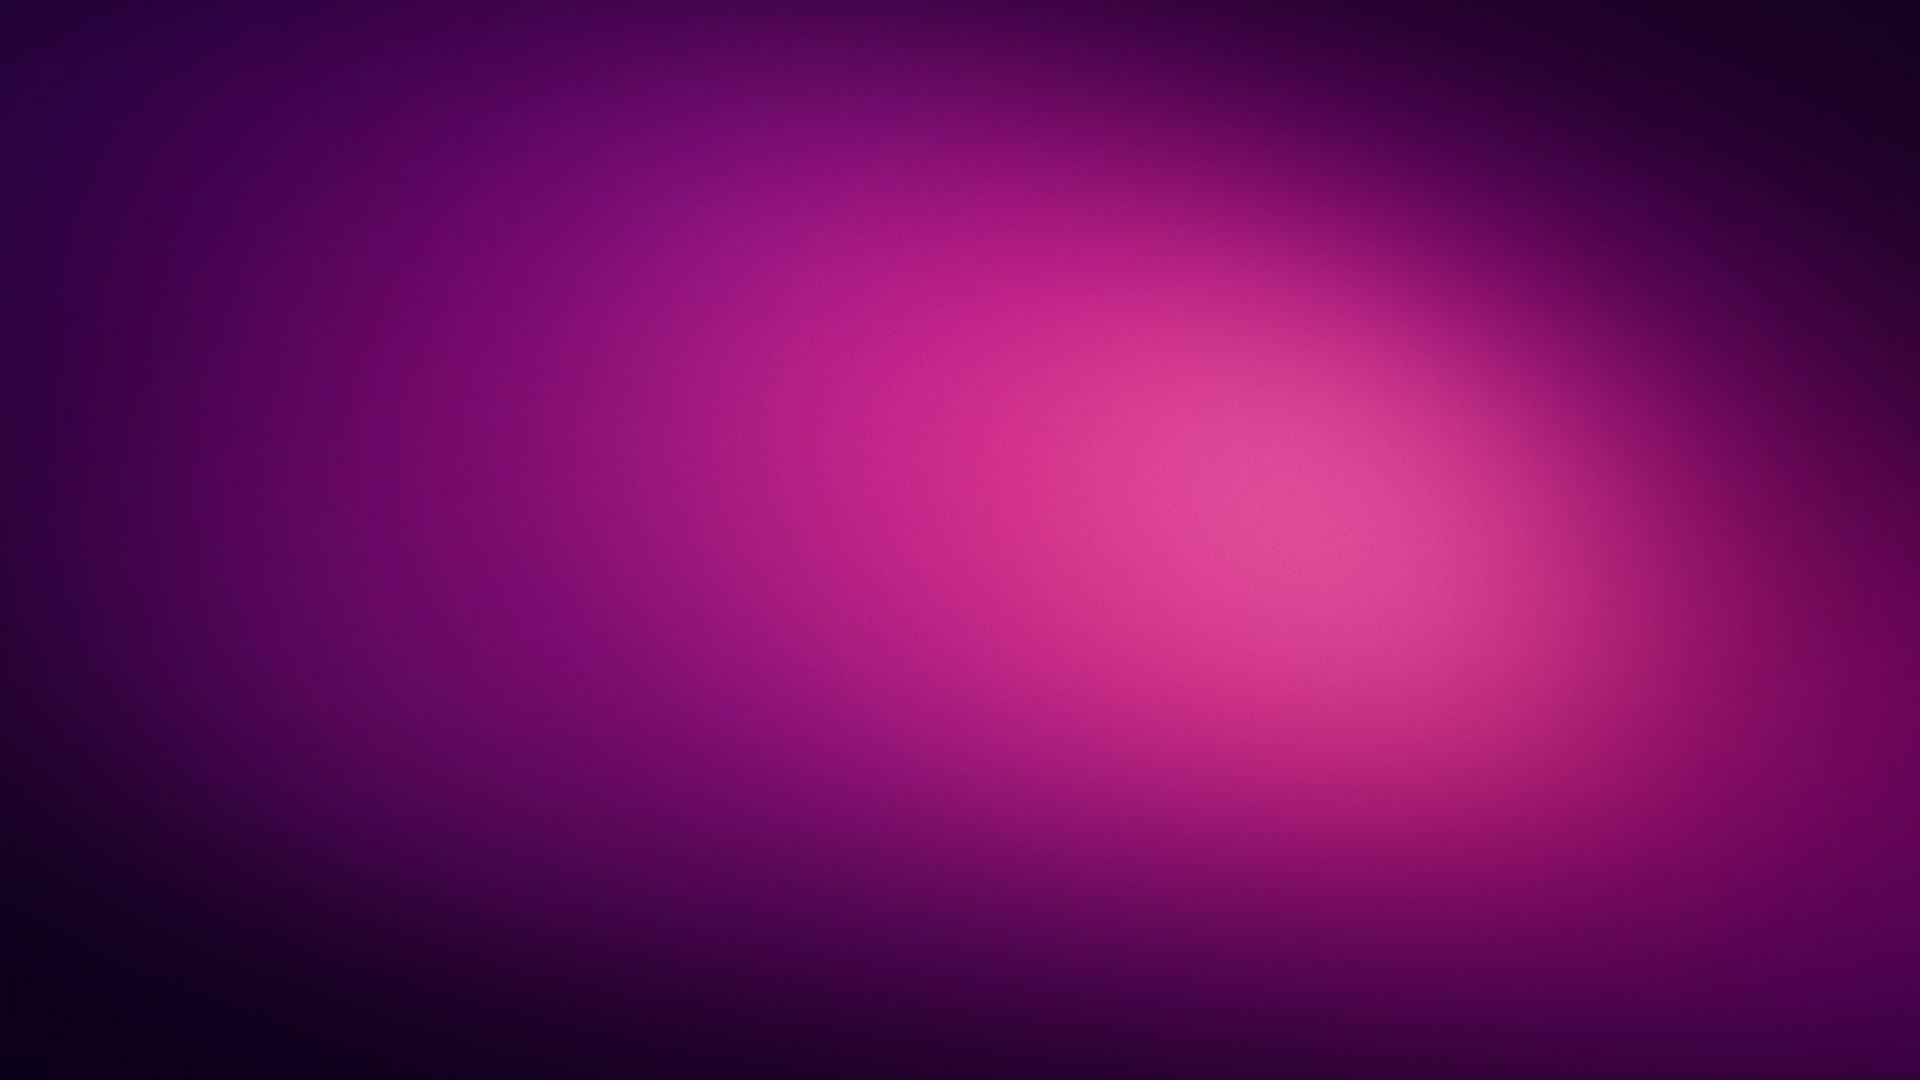 50 color wallpaper background on wallpapersafari - Wallpaper lavender color ...